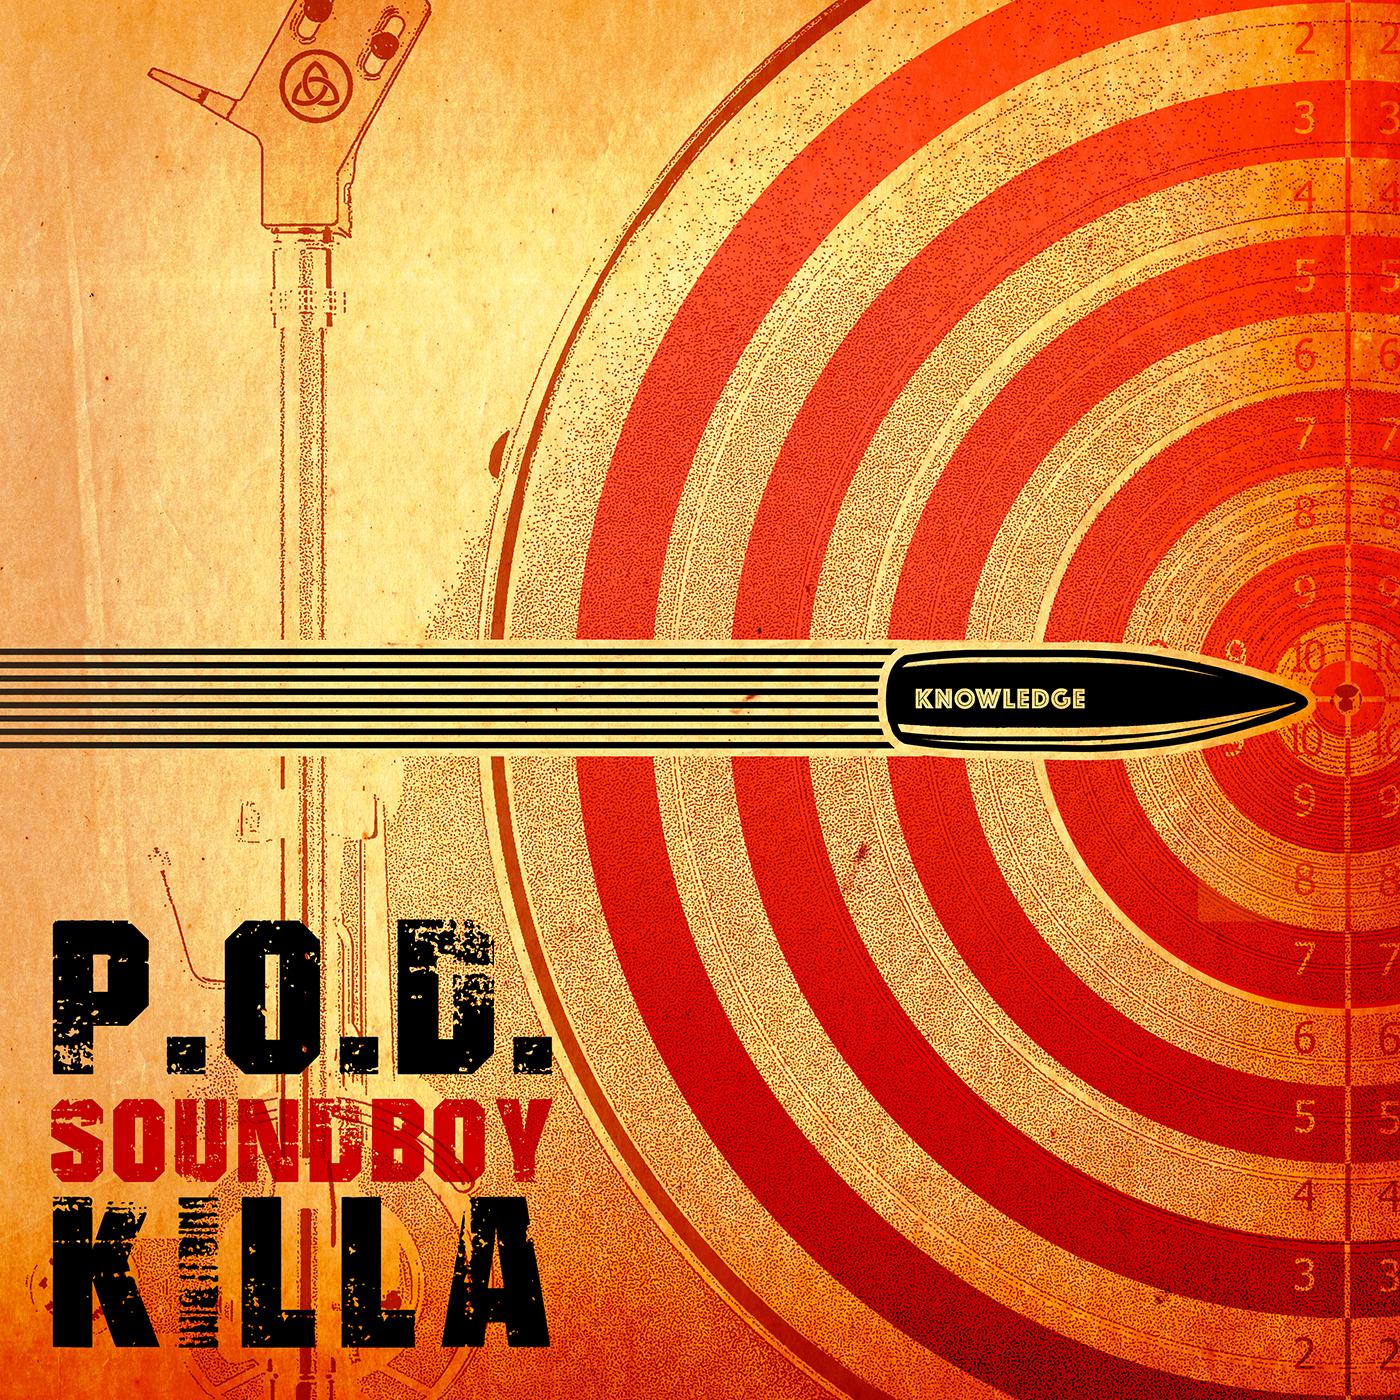 soundboykilla